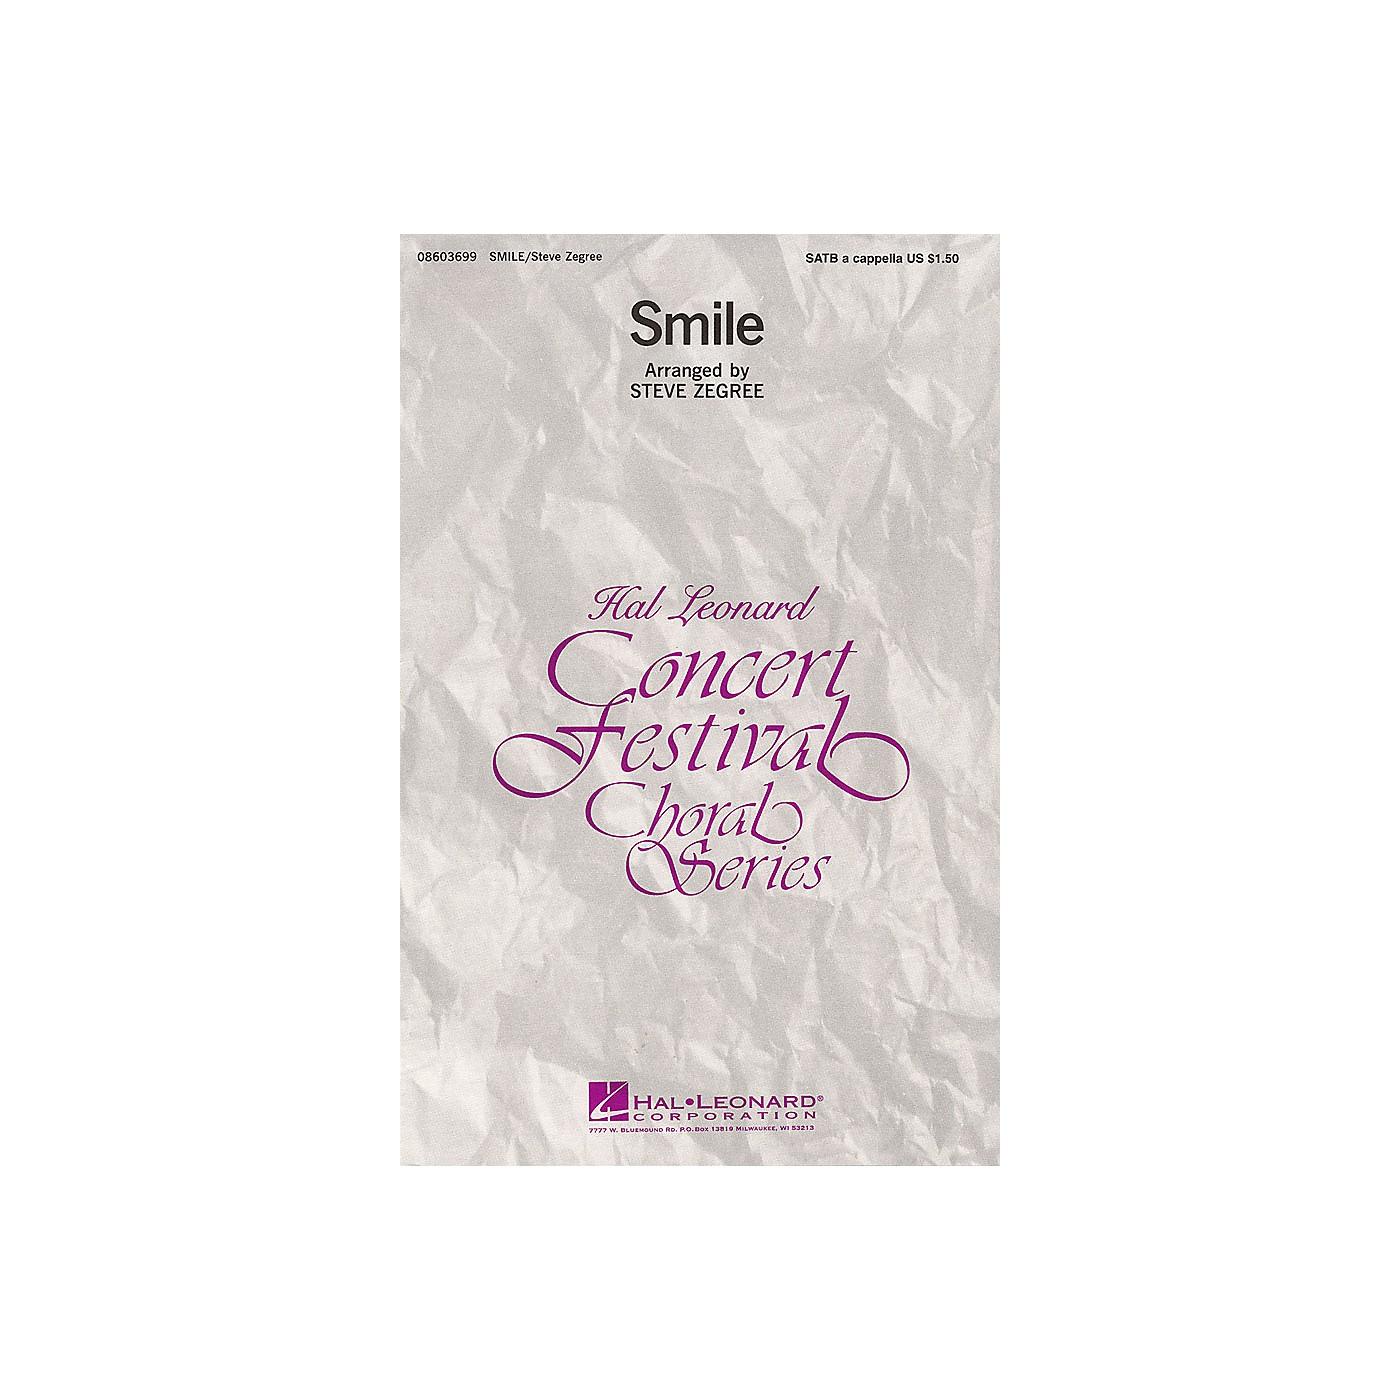 Hal Leonard Smile SATB a cappella arranged by Steve Zegree thumbnail